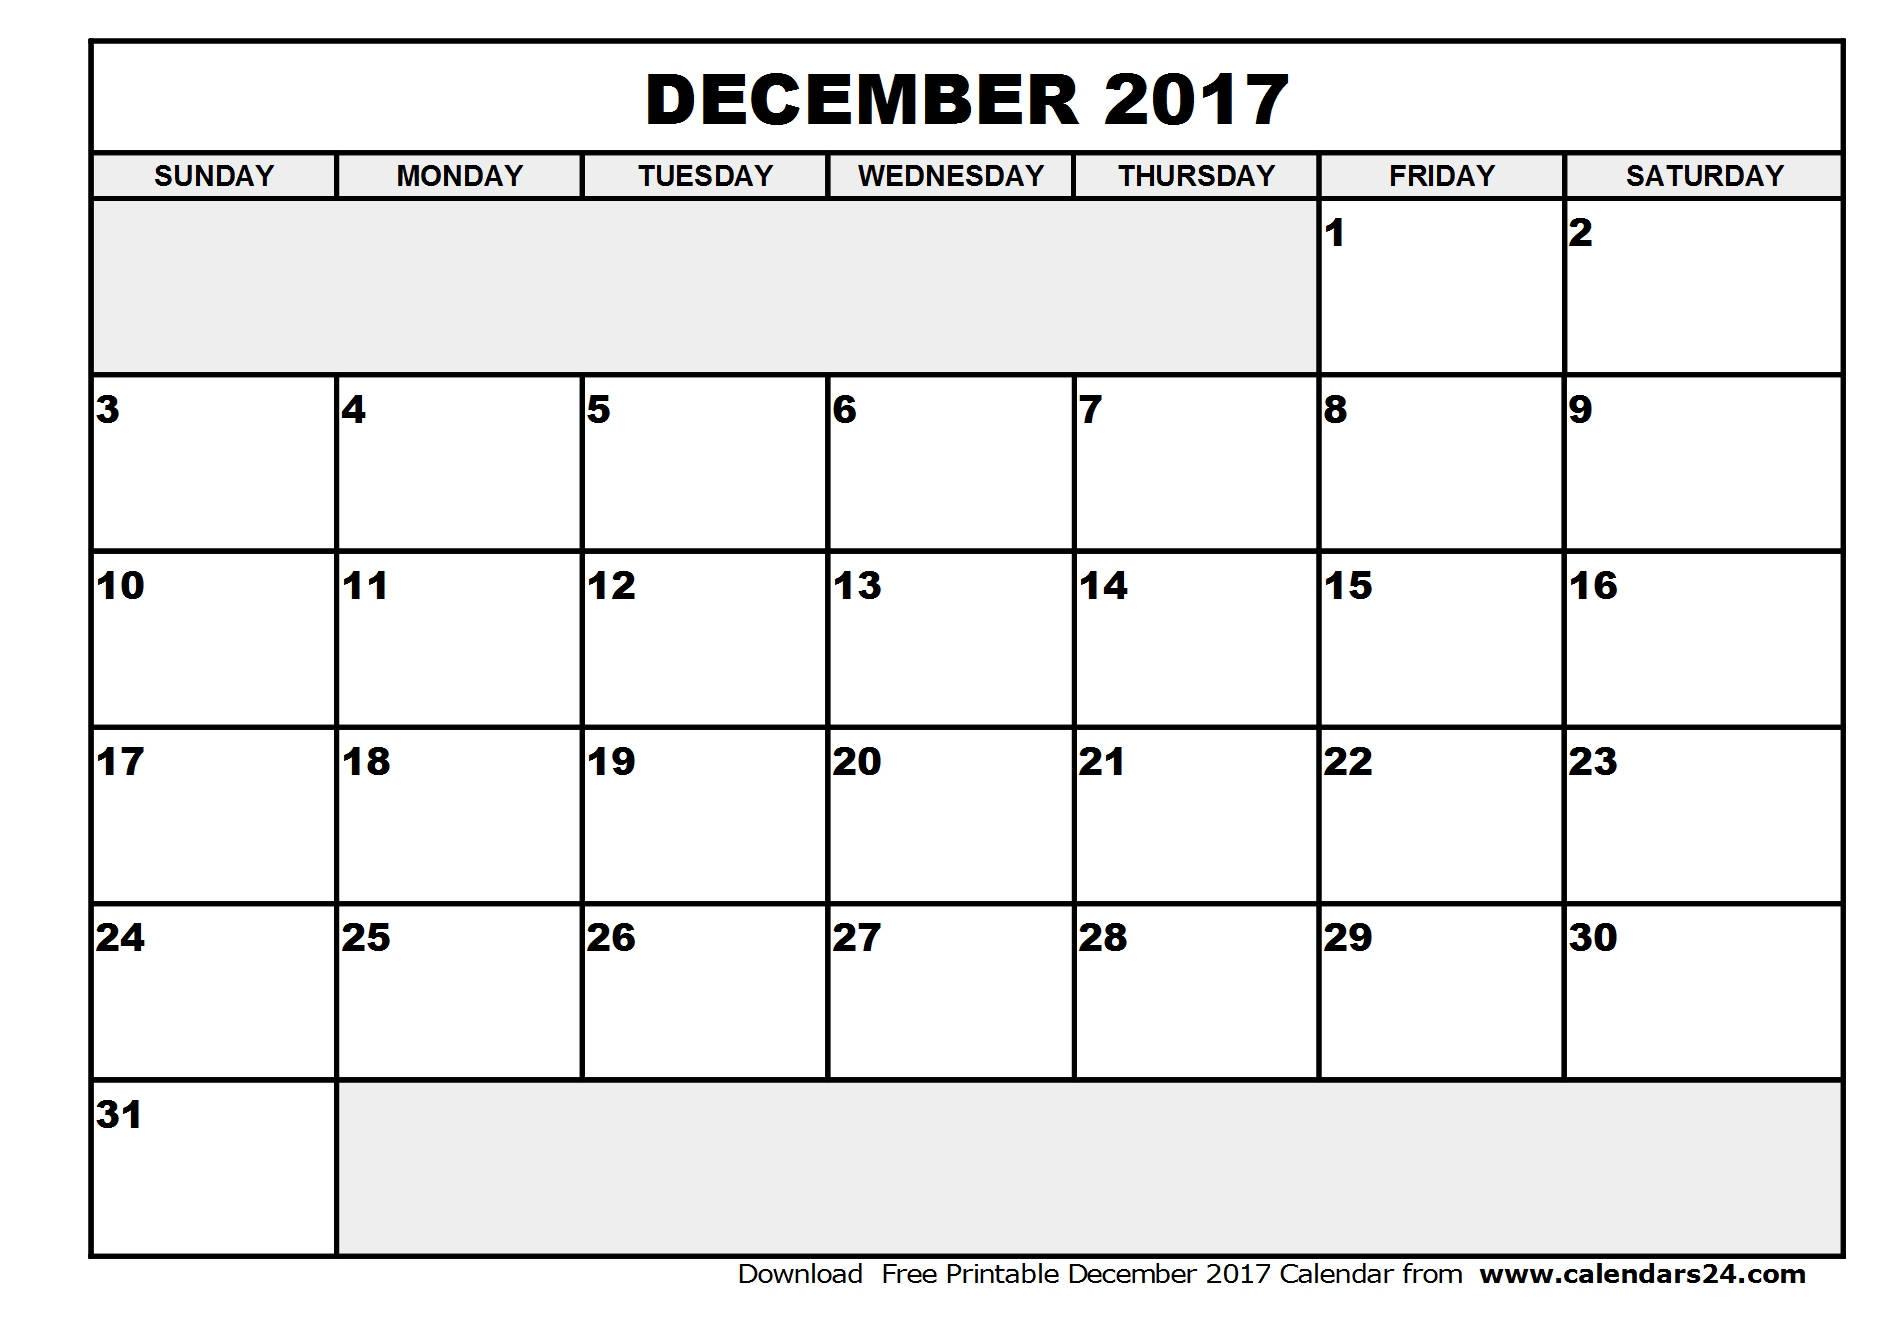 December 2017 Calendar & January 2017 Calendar